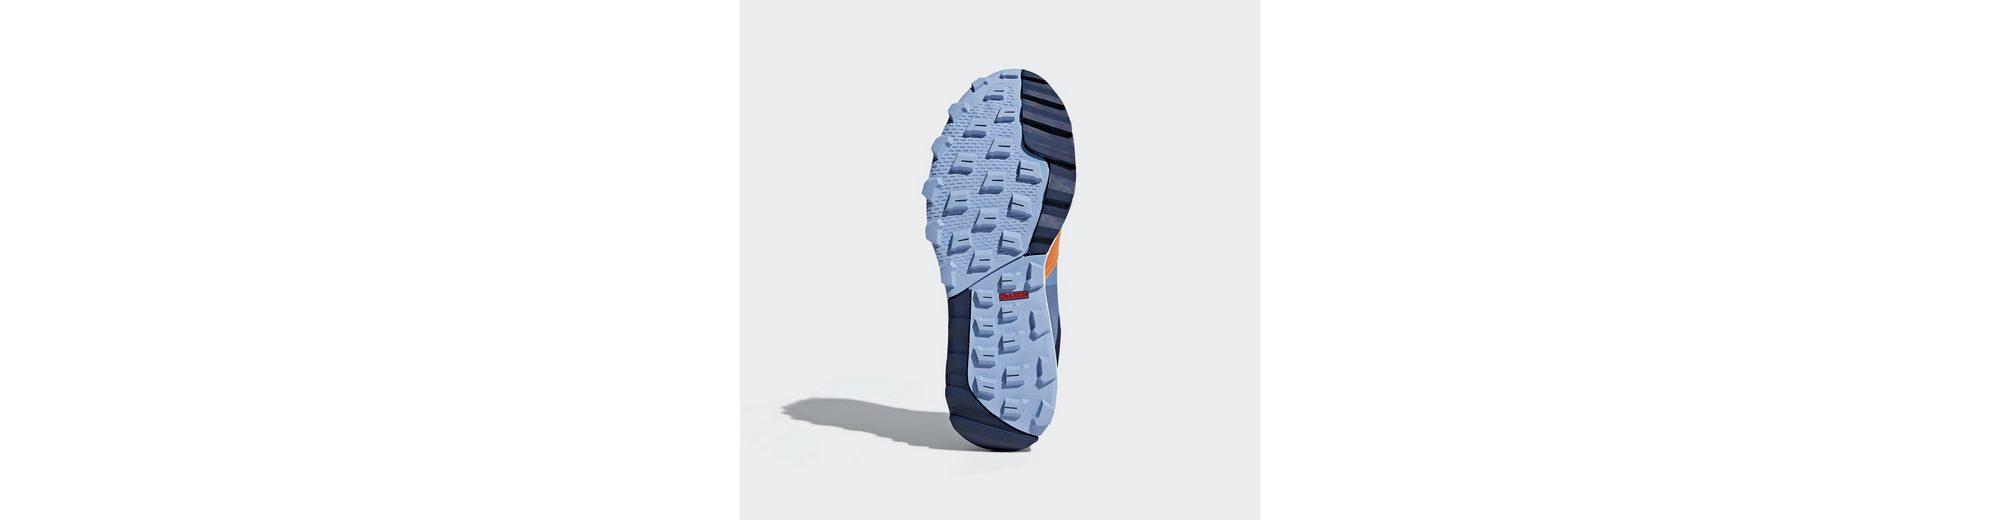 adidas Performance Kanadia 8.1 Trail Outdoorschuh Authentisch Zu Verkaufen EEmW5ZP1Kn